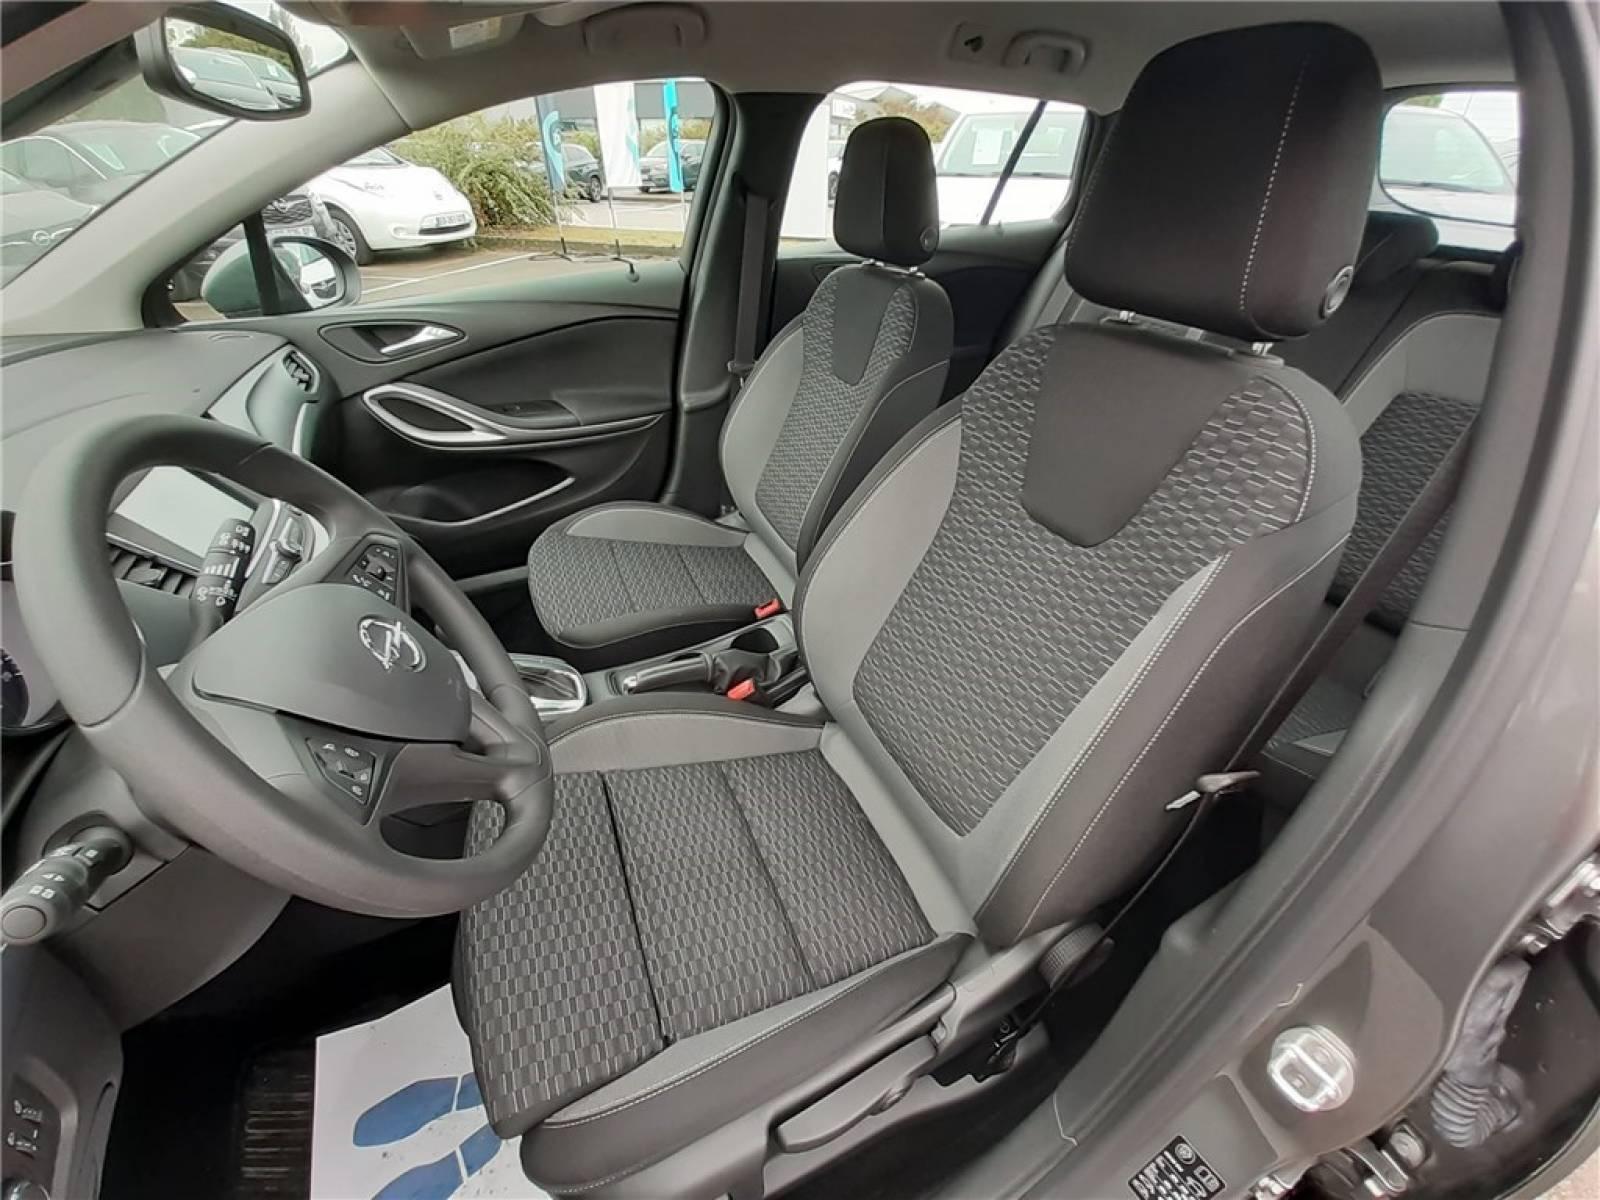 OPEL Astra Sports Tourer 1.5 Diesel 122 ch BVA9 - véhicule d'occasion - Groupe Guillet - Opel Magicauto - Chalon-sur-Saône - 71380 - Saint-Marcel - 21